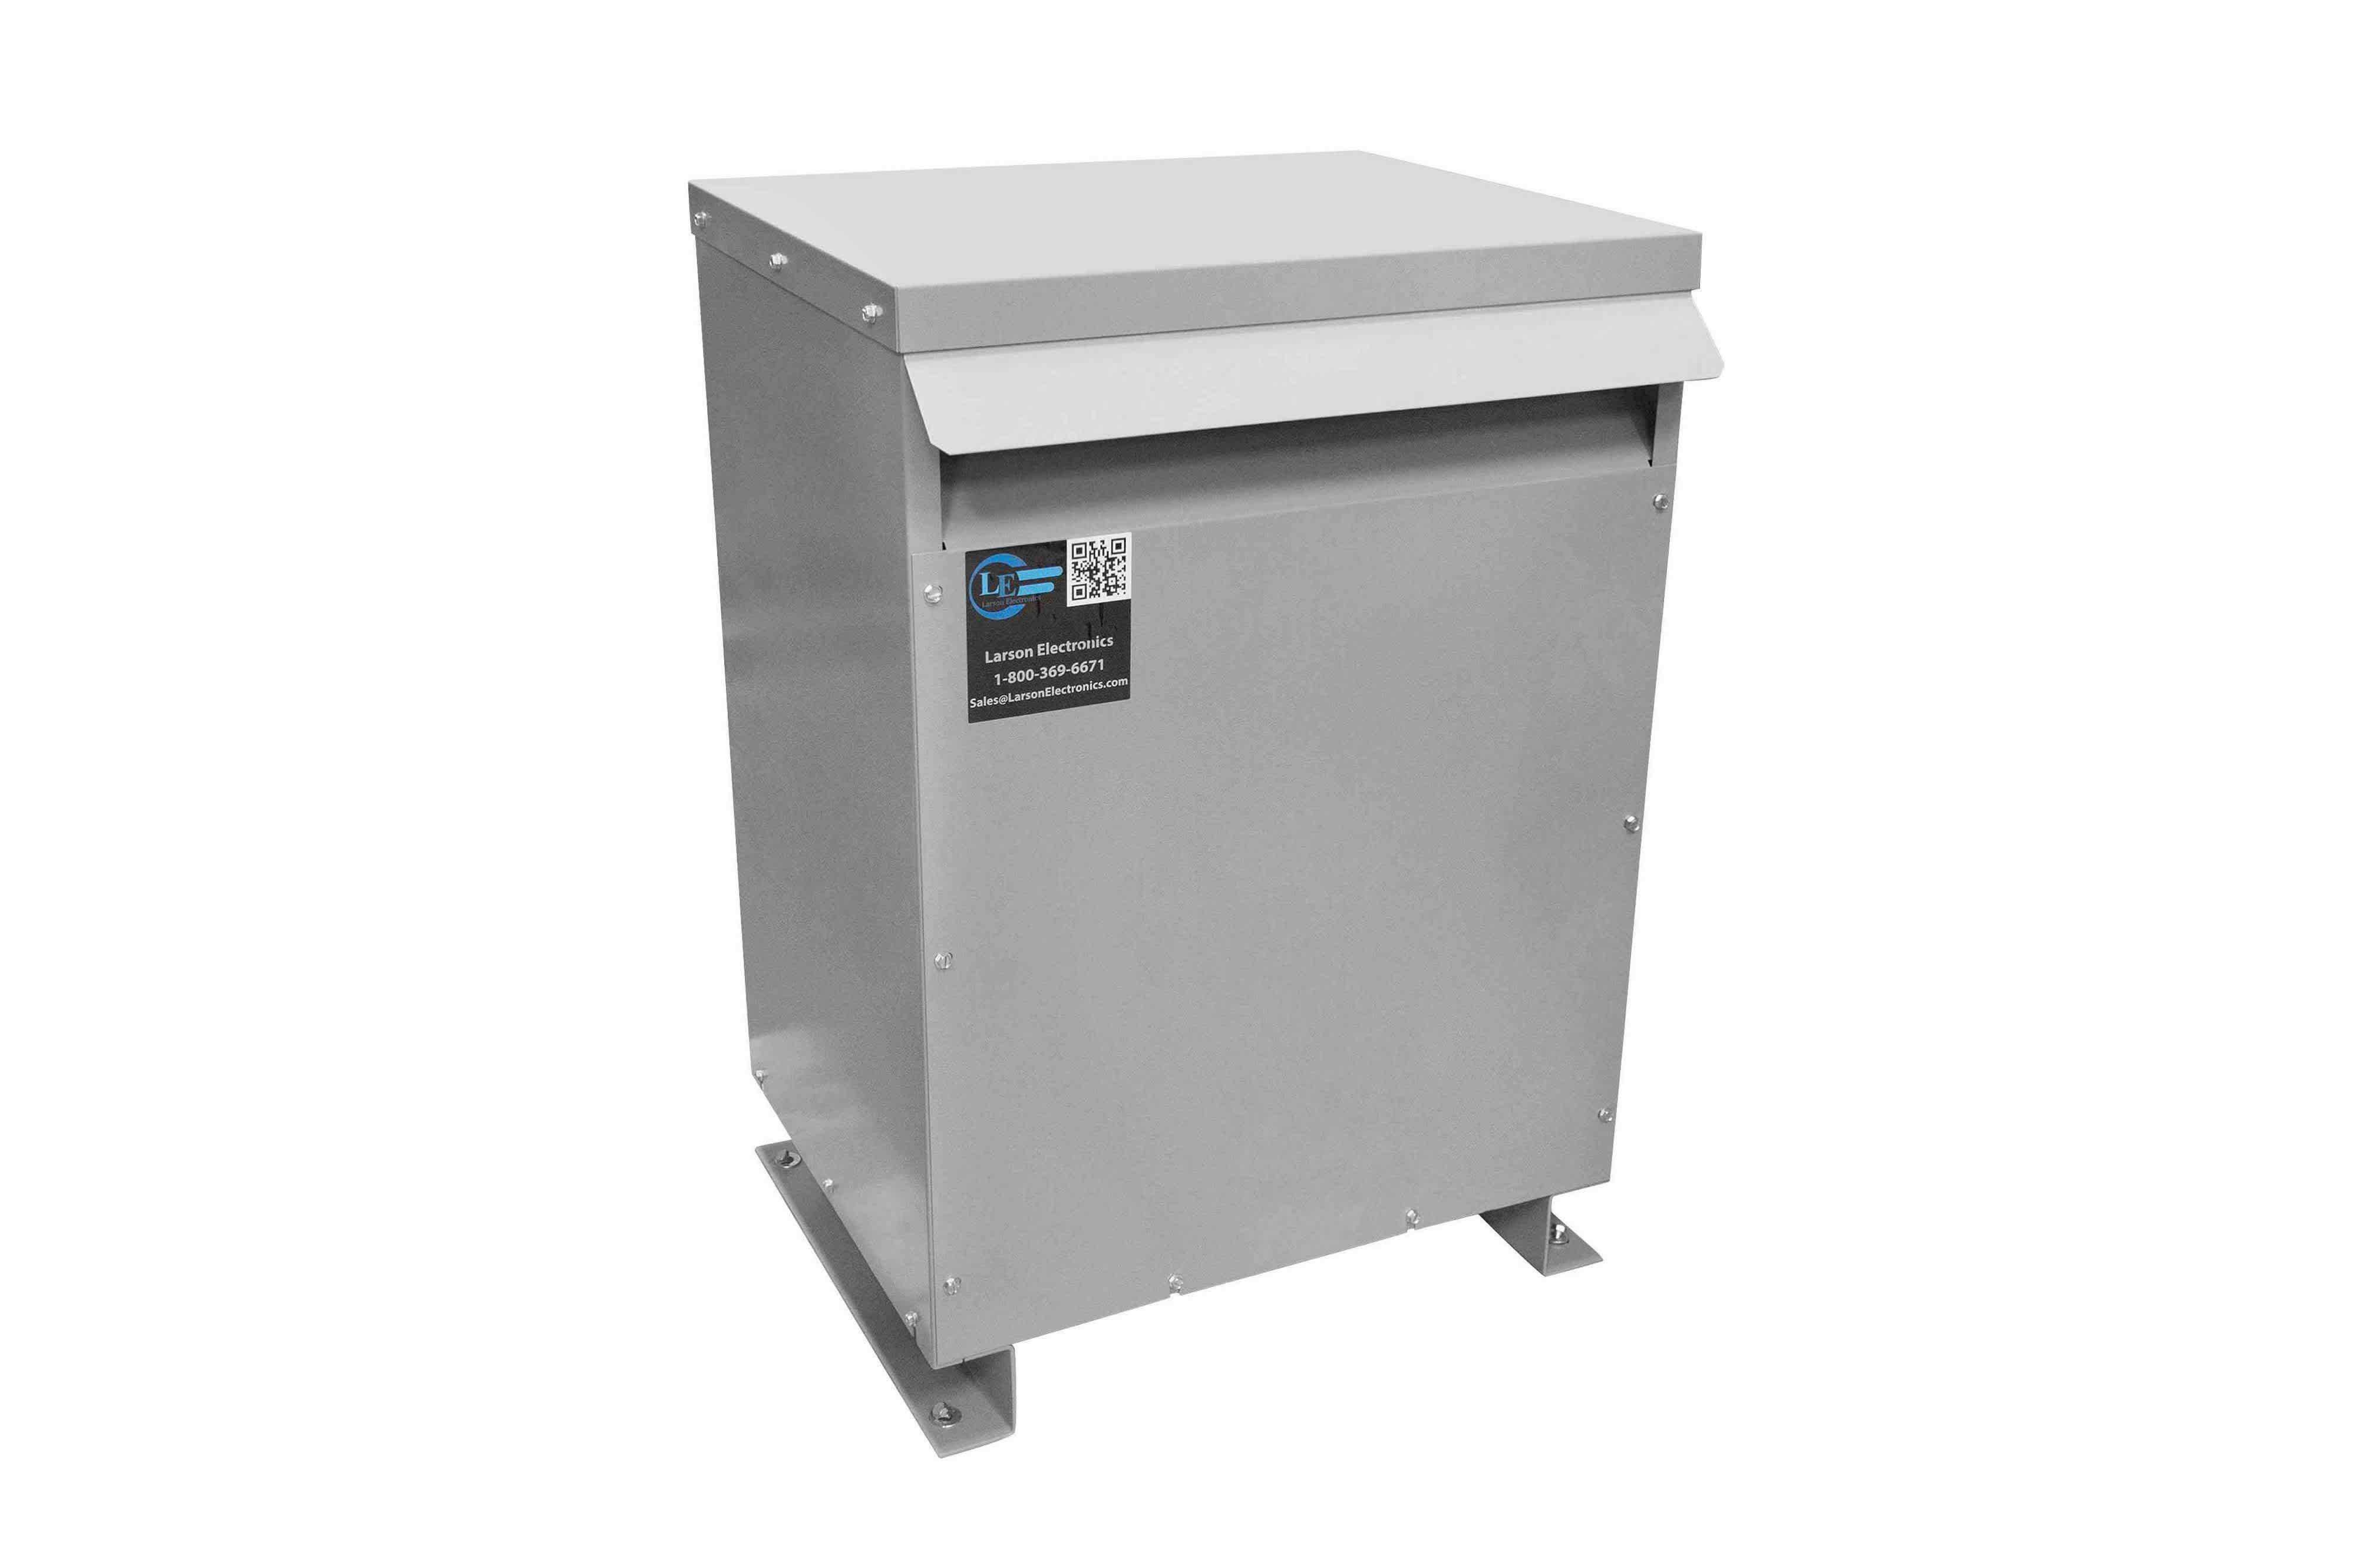 800 kVA 3PH DOE Transformer, 240V Delta Primary, 600Y/347 Wye-N Secondary, N3R, Ventilated, 60 Hz